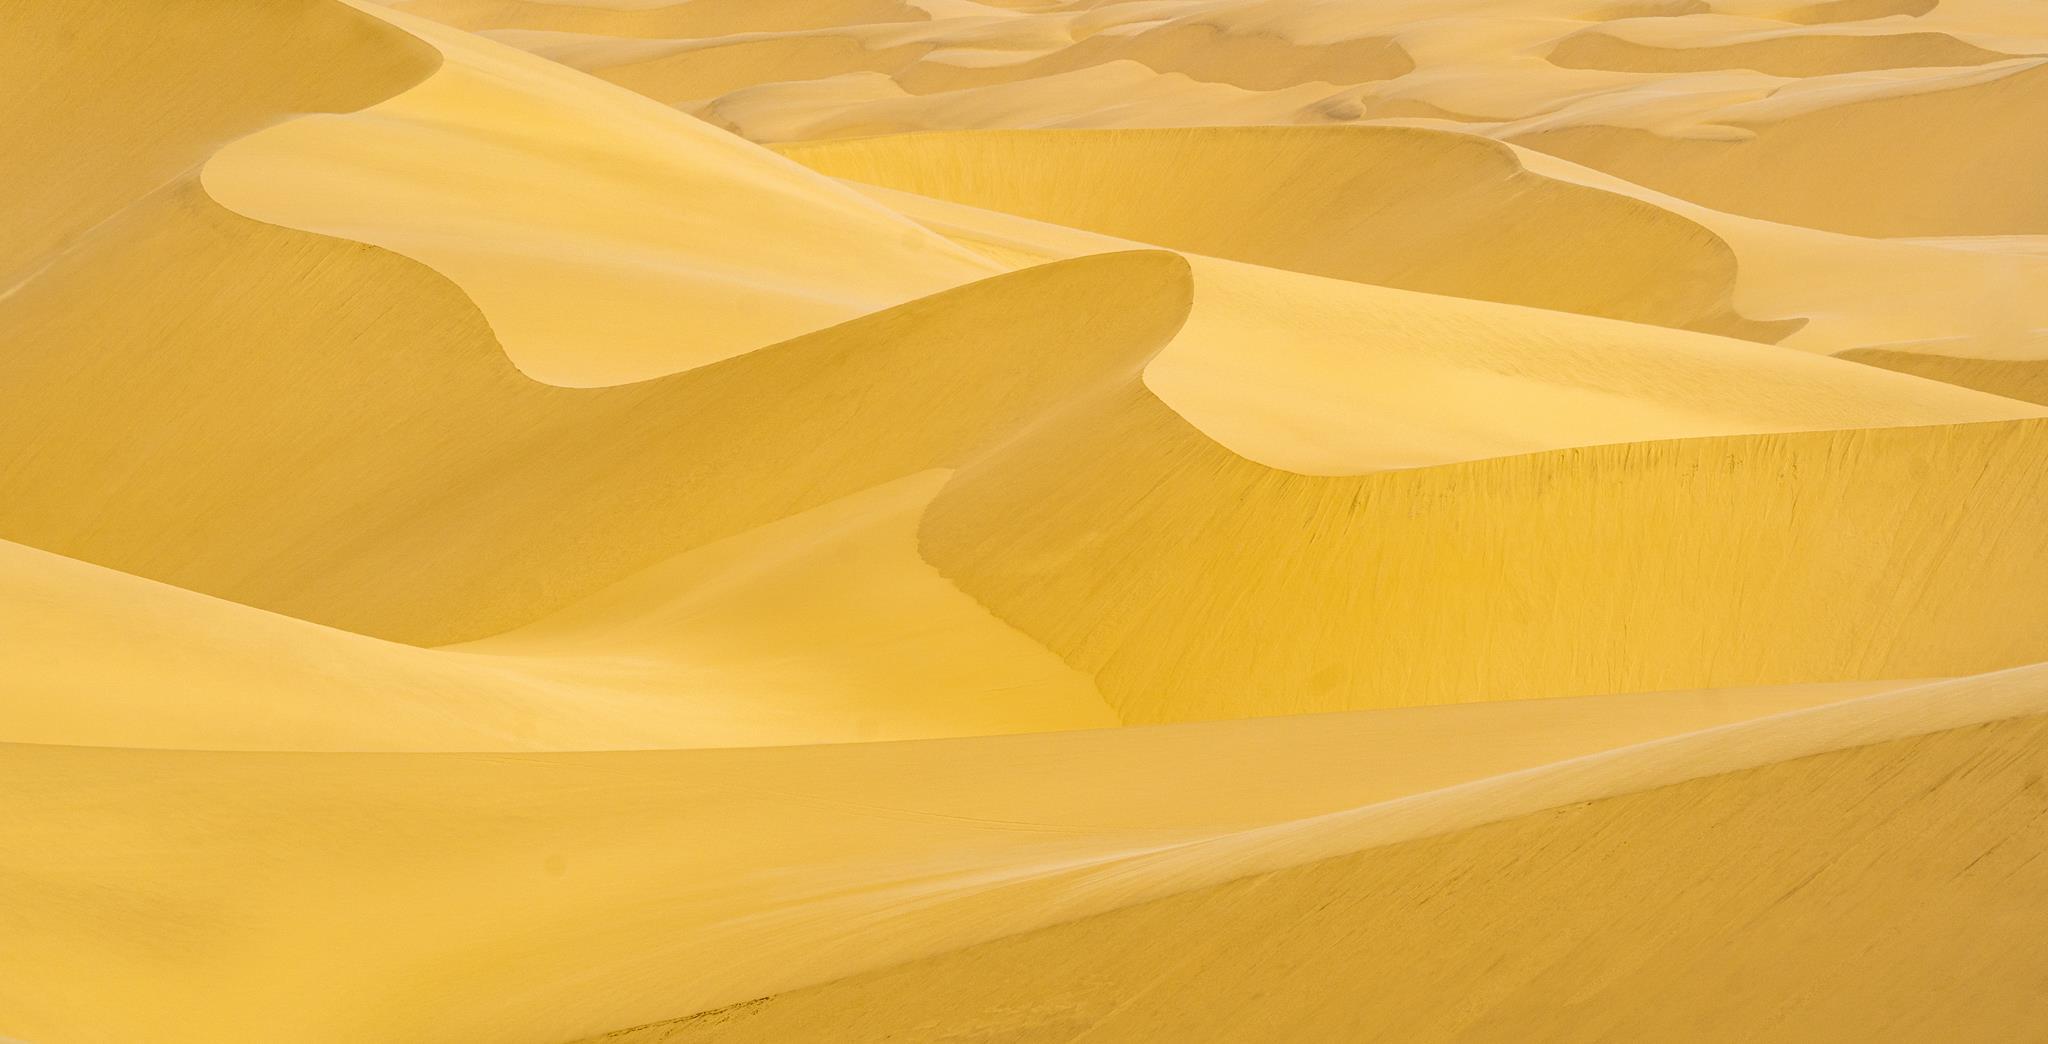 Afrika-Namibia-World-Geographic-Excursio